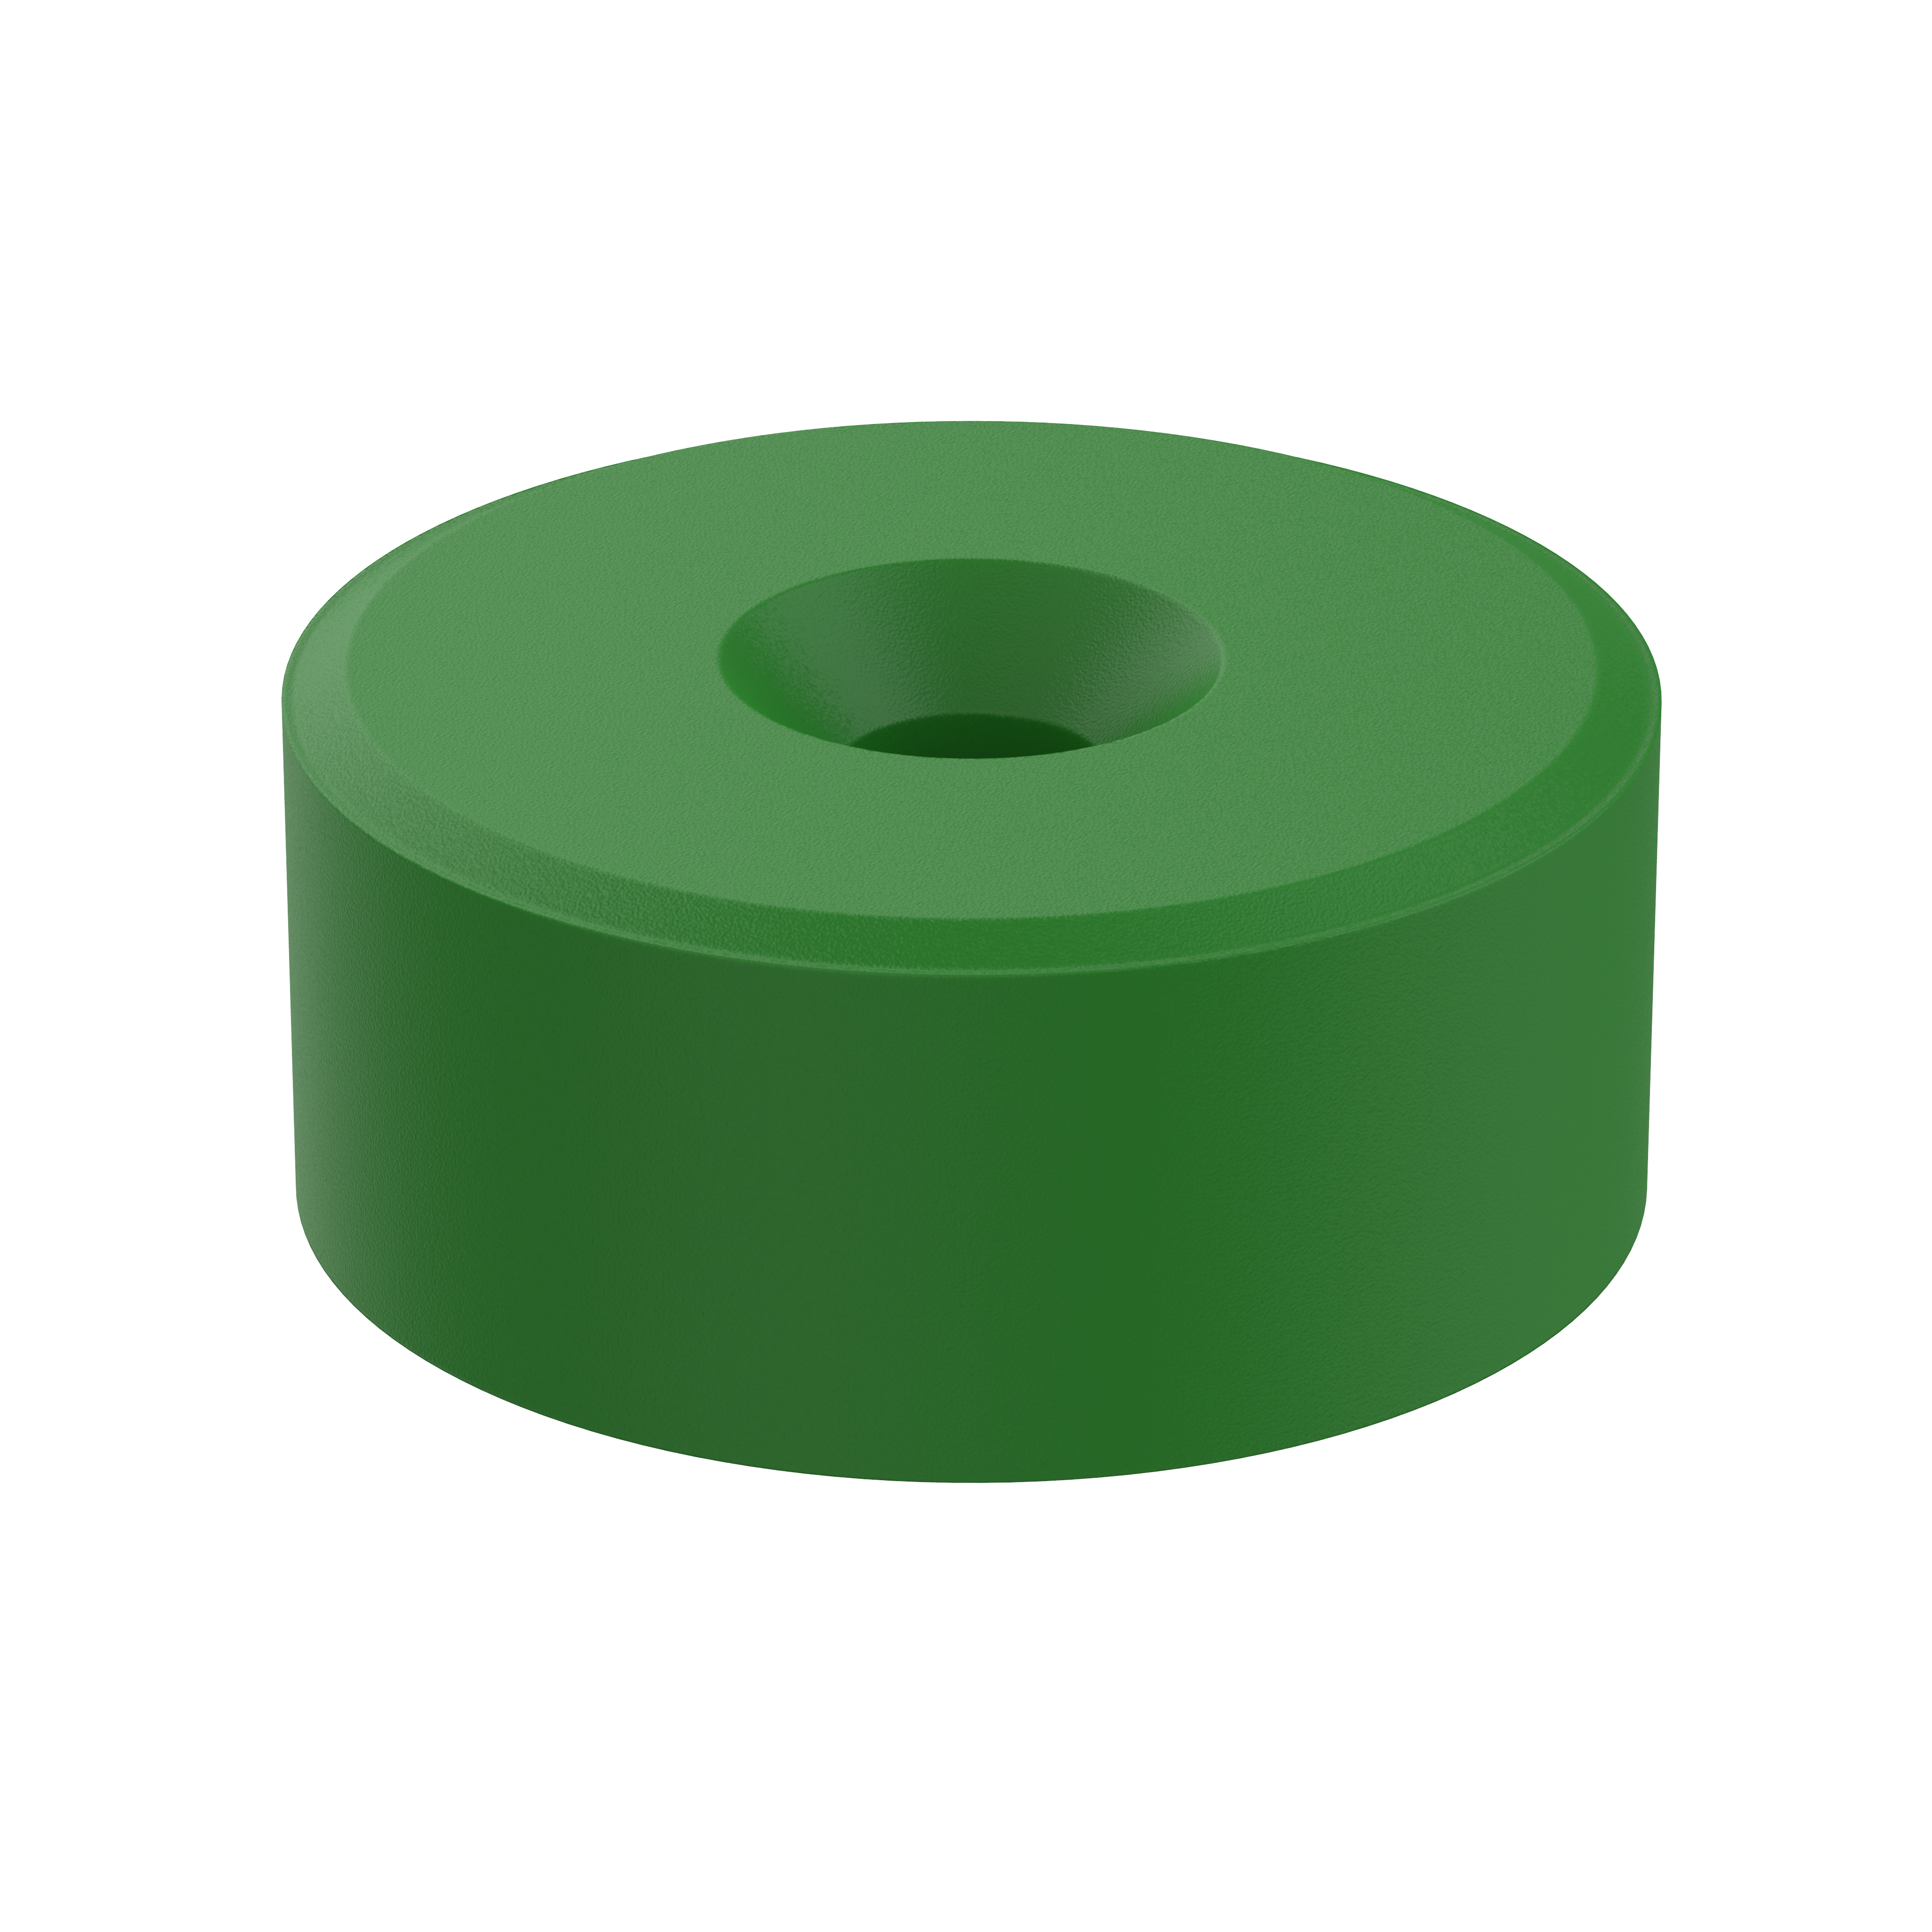 Magnet / Betätiger - Oxid-Magnet Ø 23x10mm - 300783